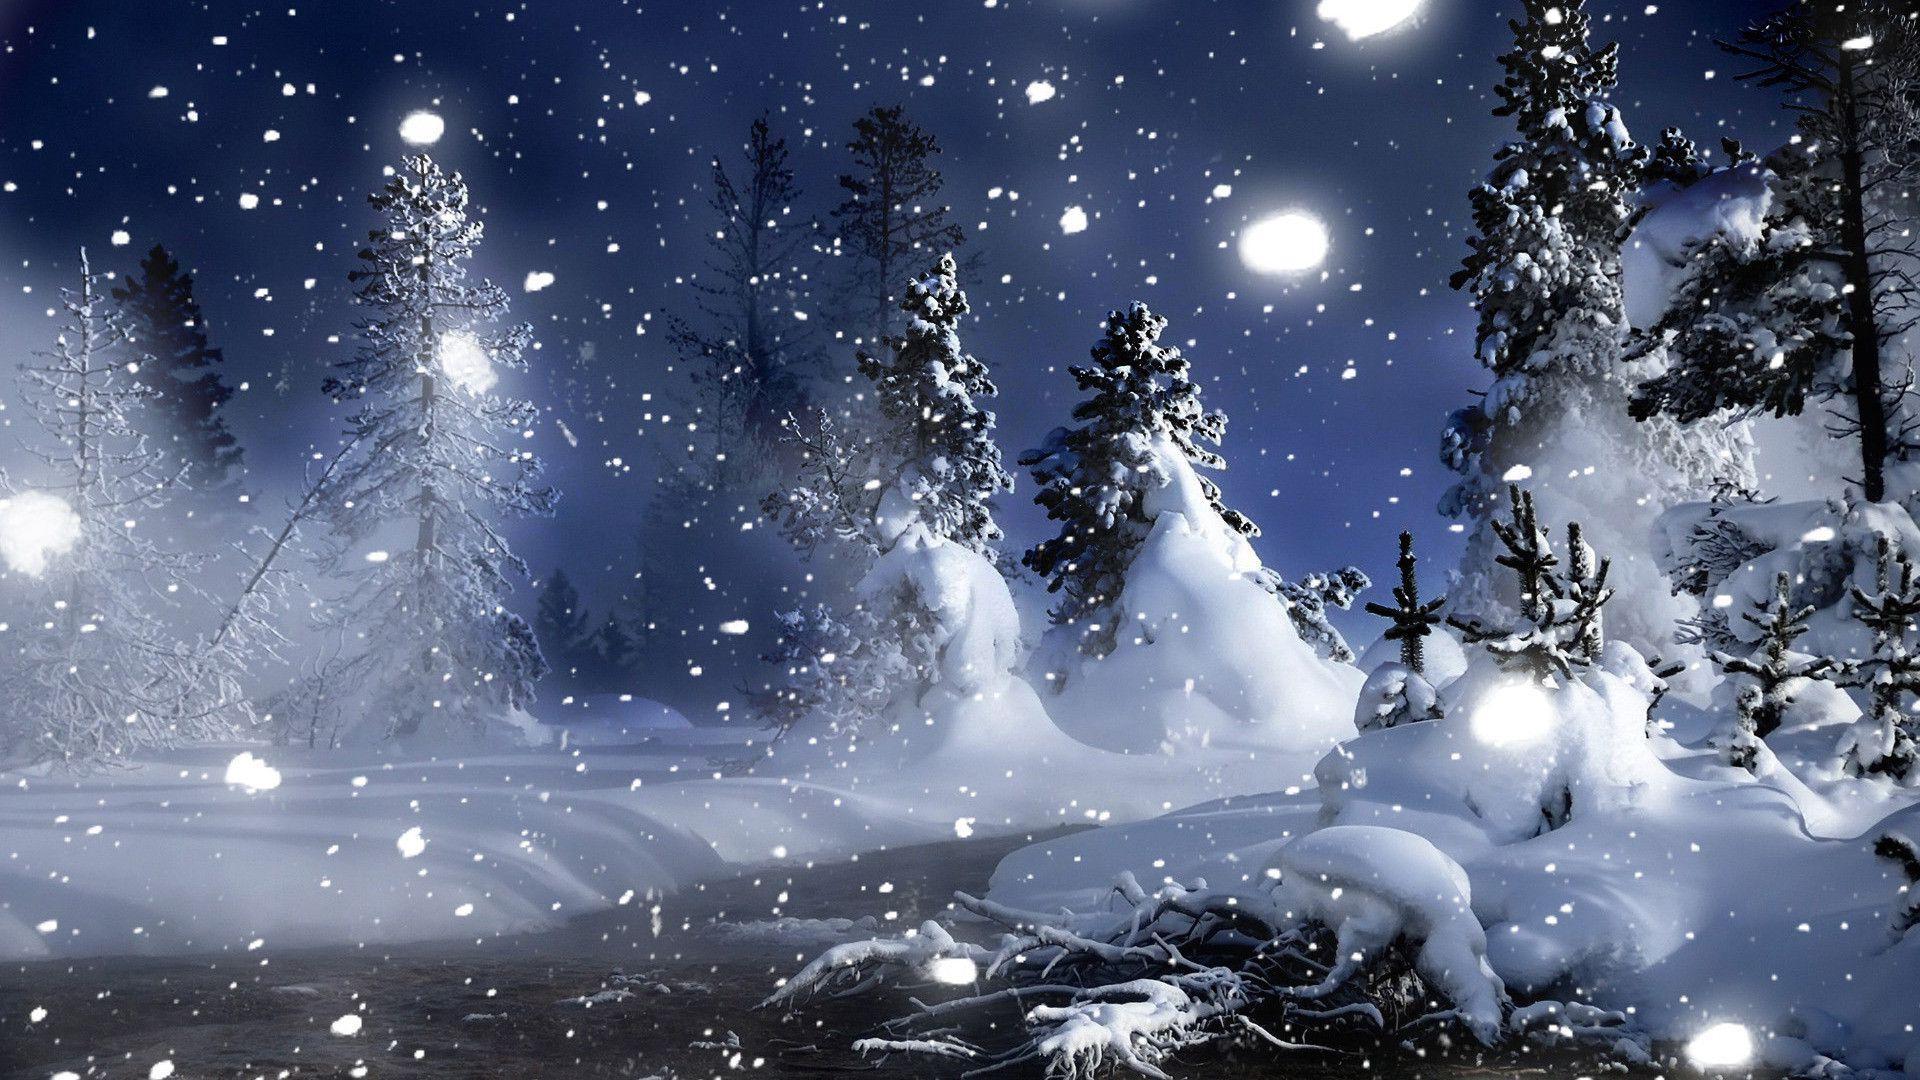 Download Snow Nighttime Wallpaper 1024x768   Wallpoper #373562